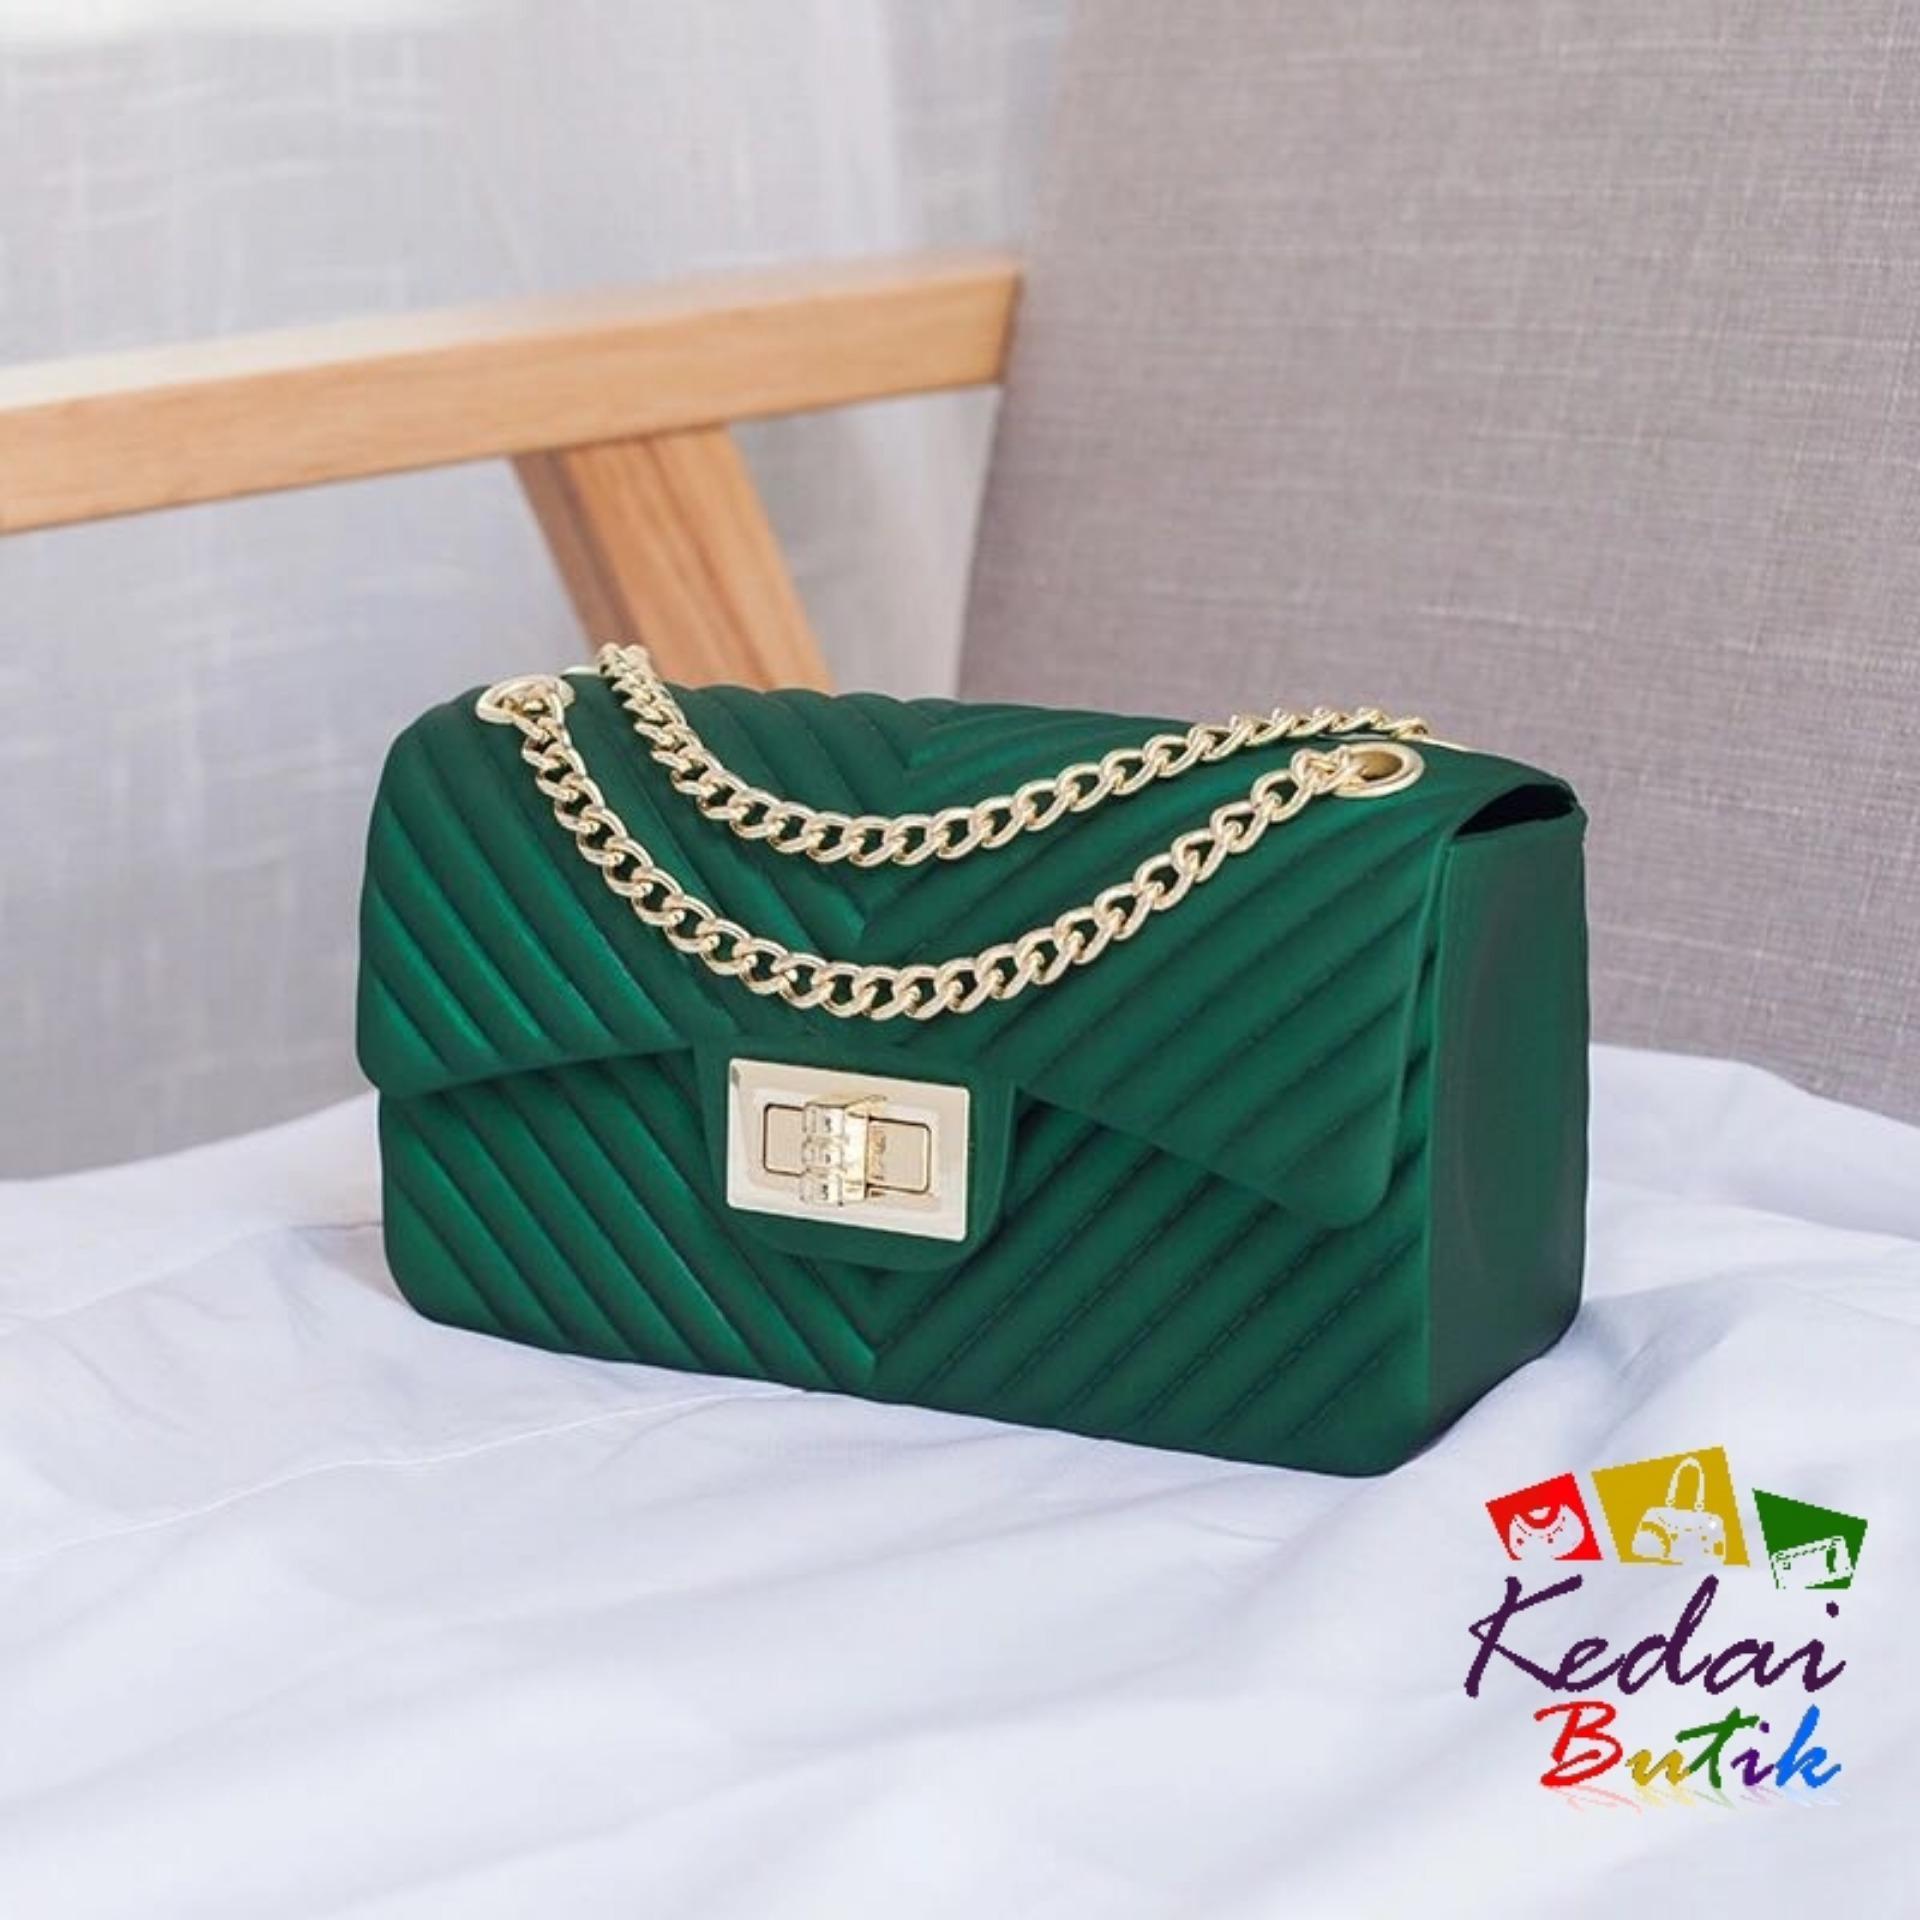 Kedaibutik-005 KECIL Tas Jelly Matte Chevron   Tas Premium plus boneka dan  syal   3bd3fabf91